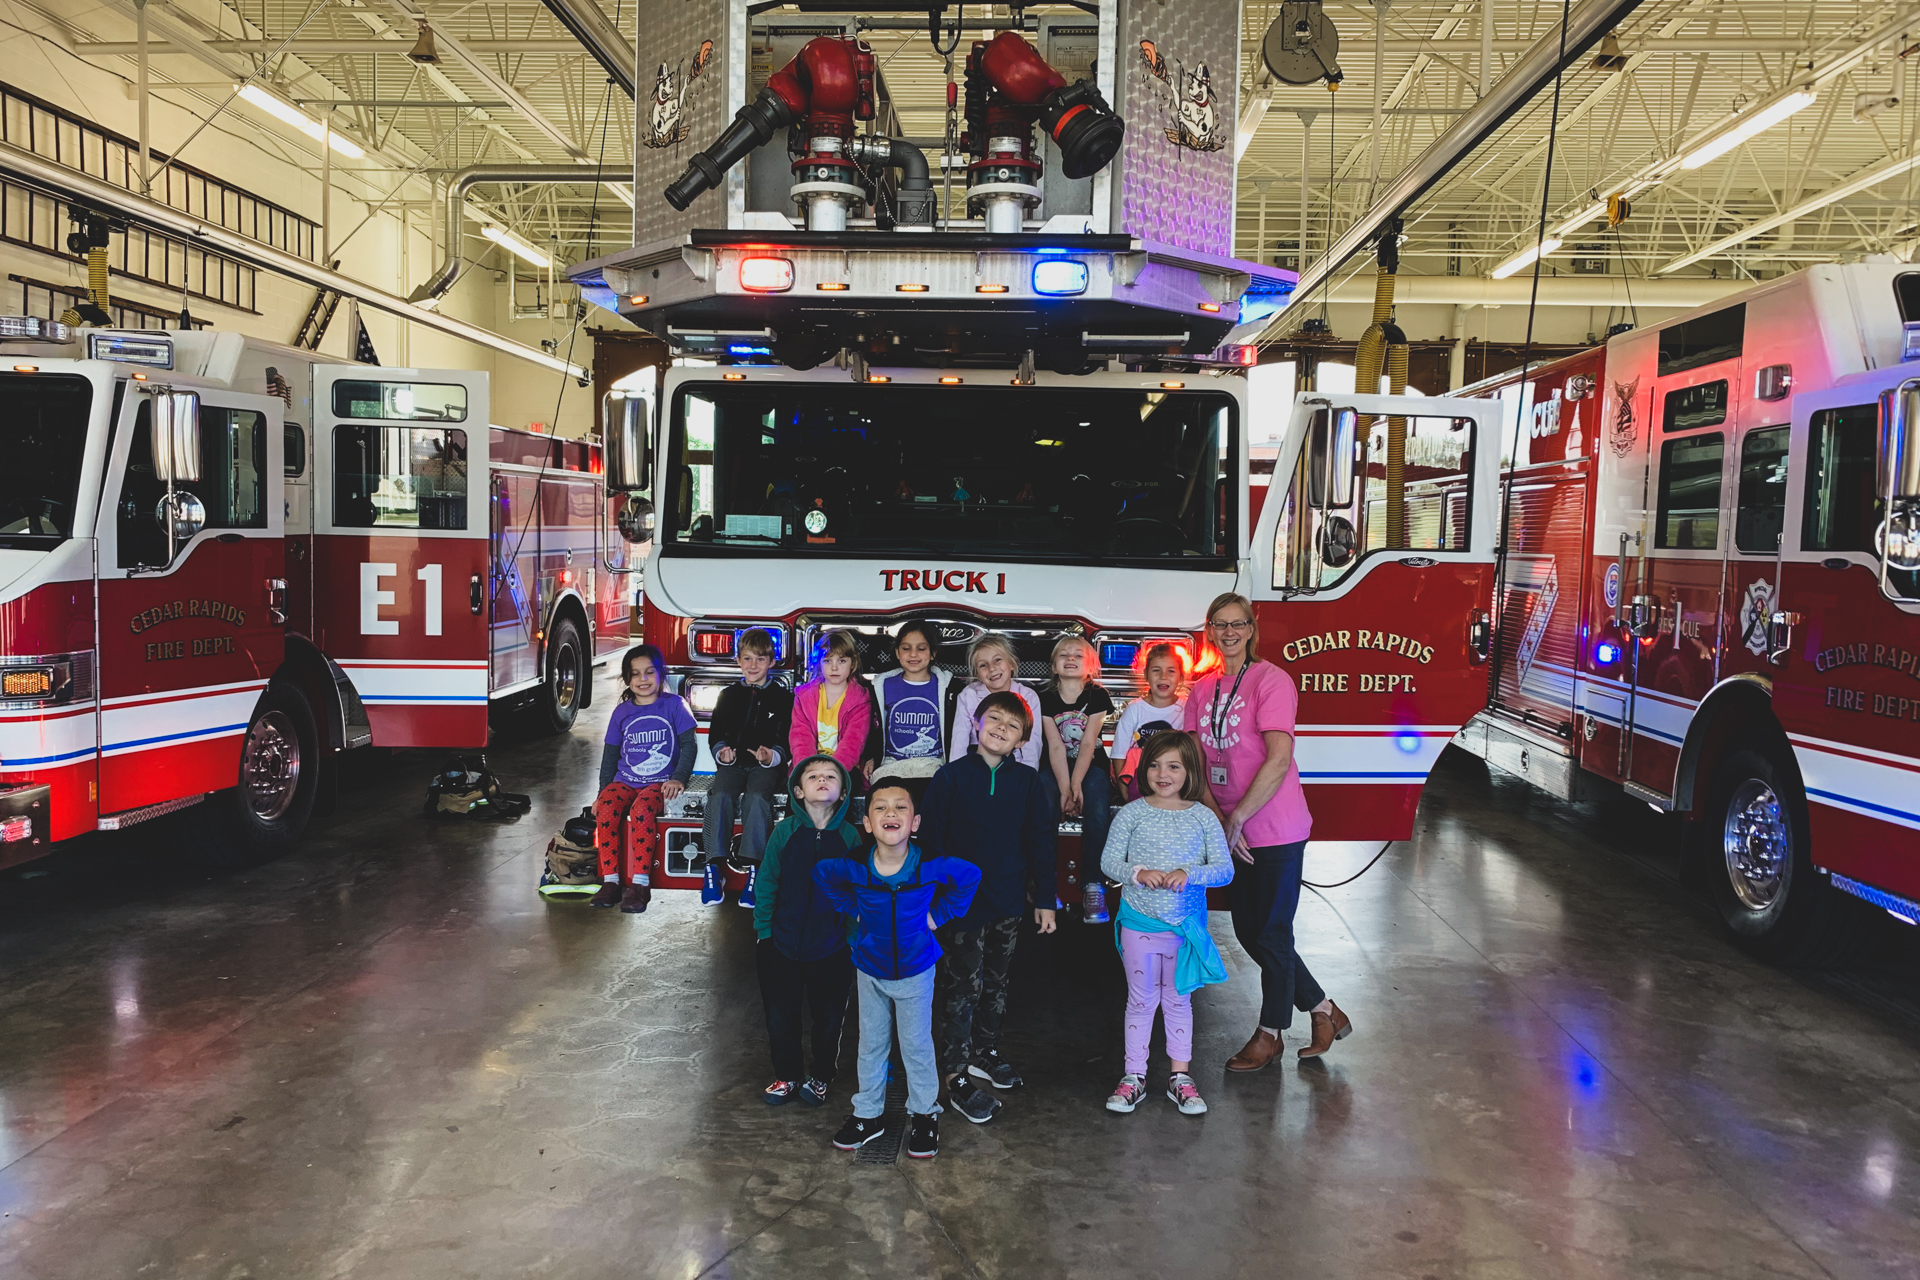 Summit Schools Cedar Rapids Fire Department